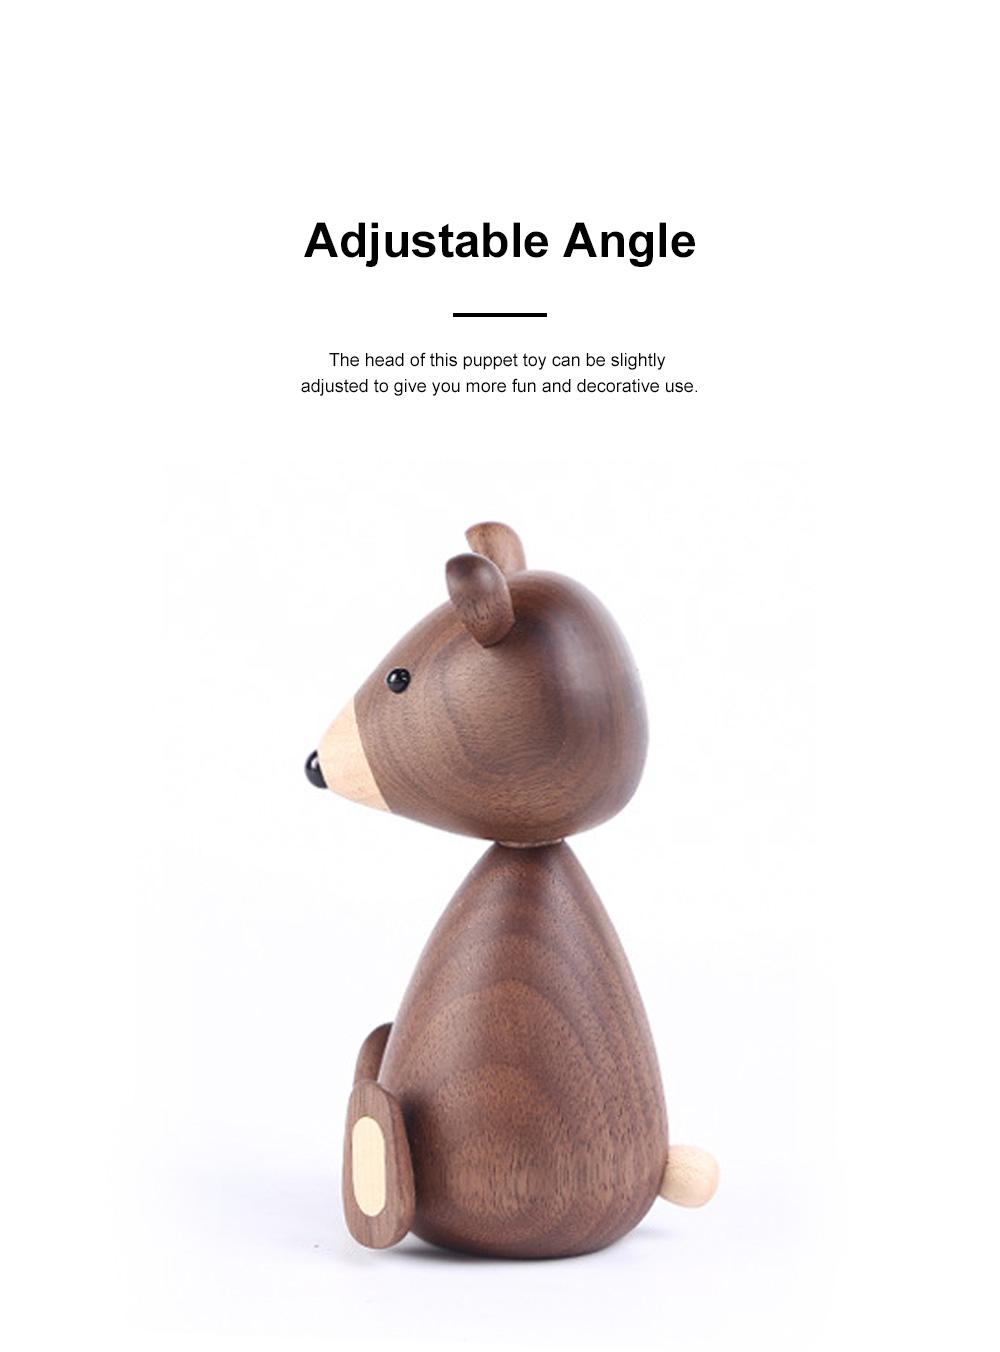 Nordic Creative Puppets Walnut Bears Danish Squirrels Creative Home Furnishings Birthday Gifts 1